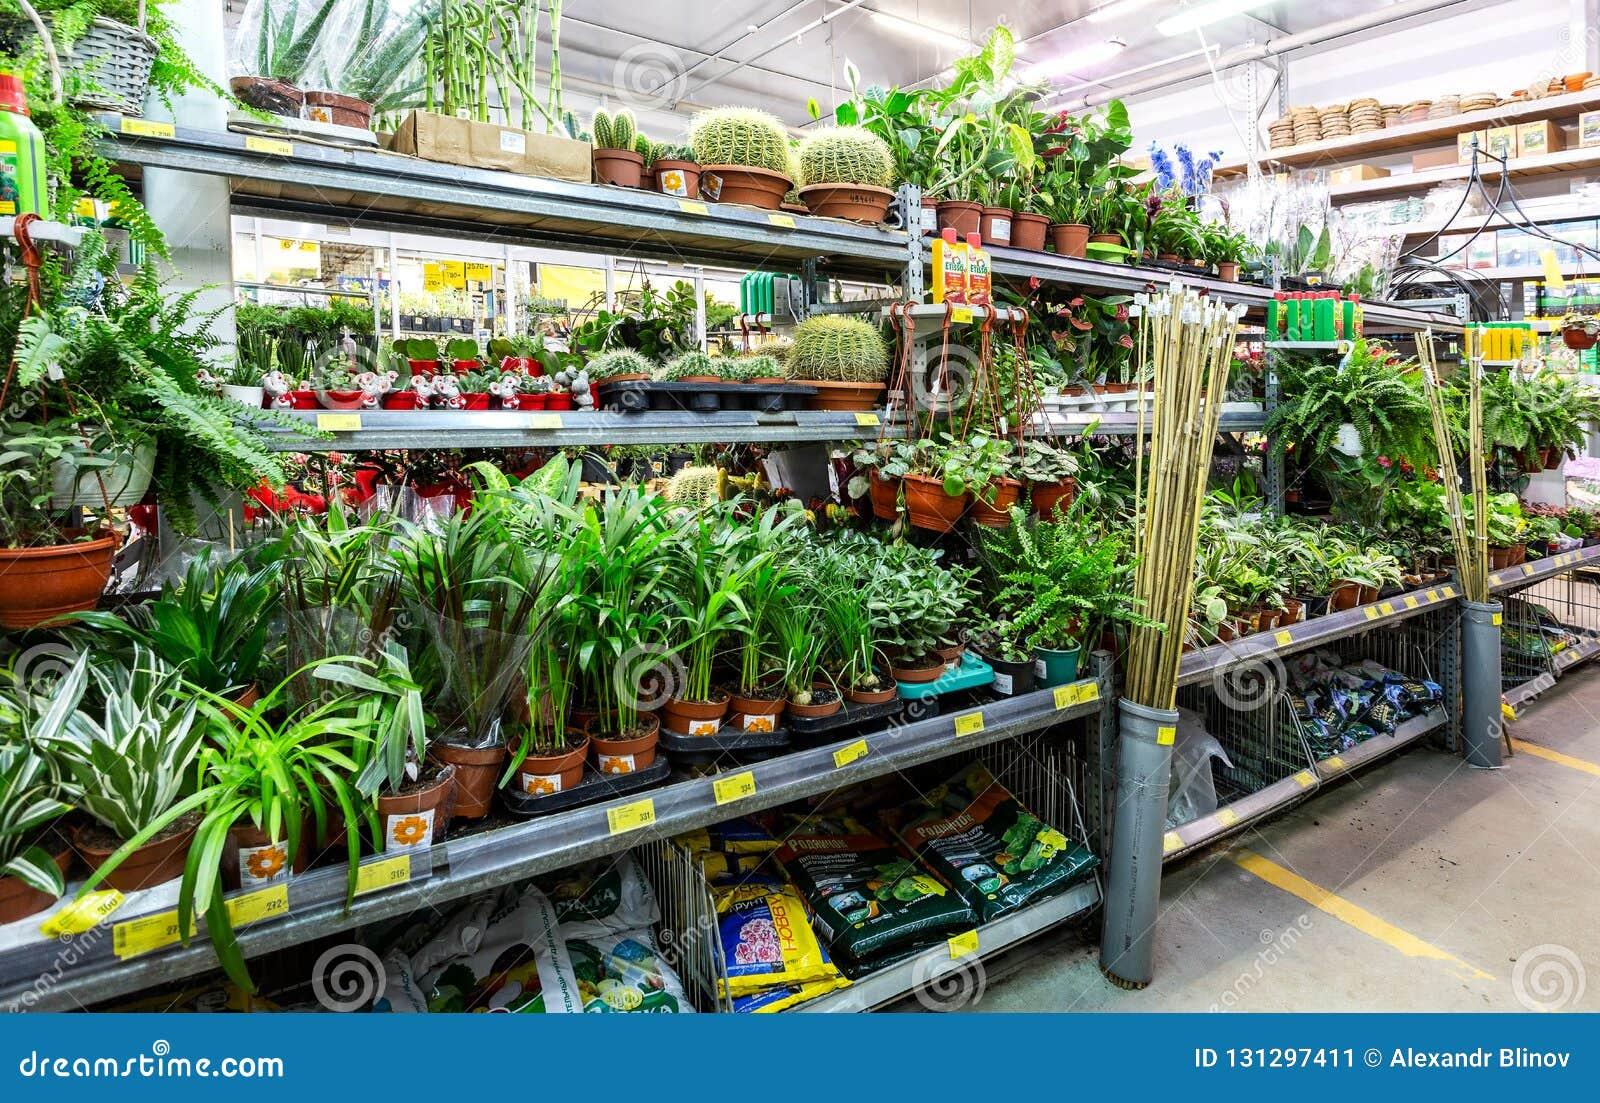 Pot De Graisse Castorama selling potted plants and flowers editorial photo - image of